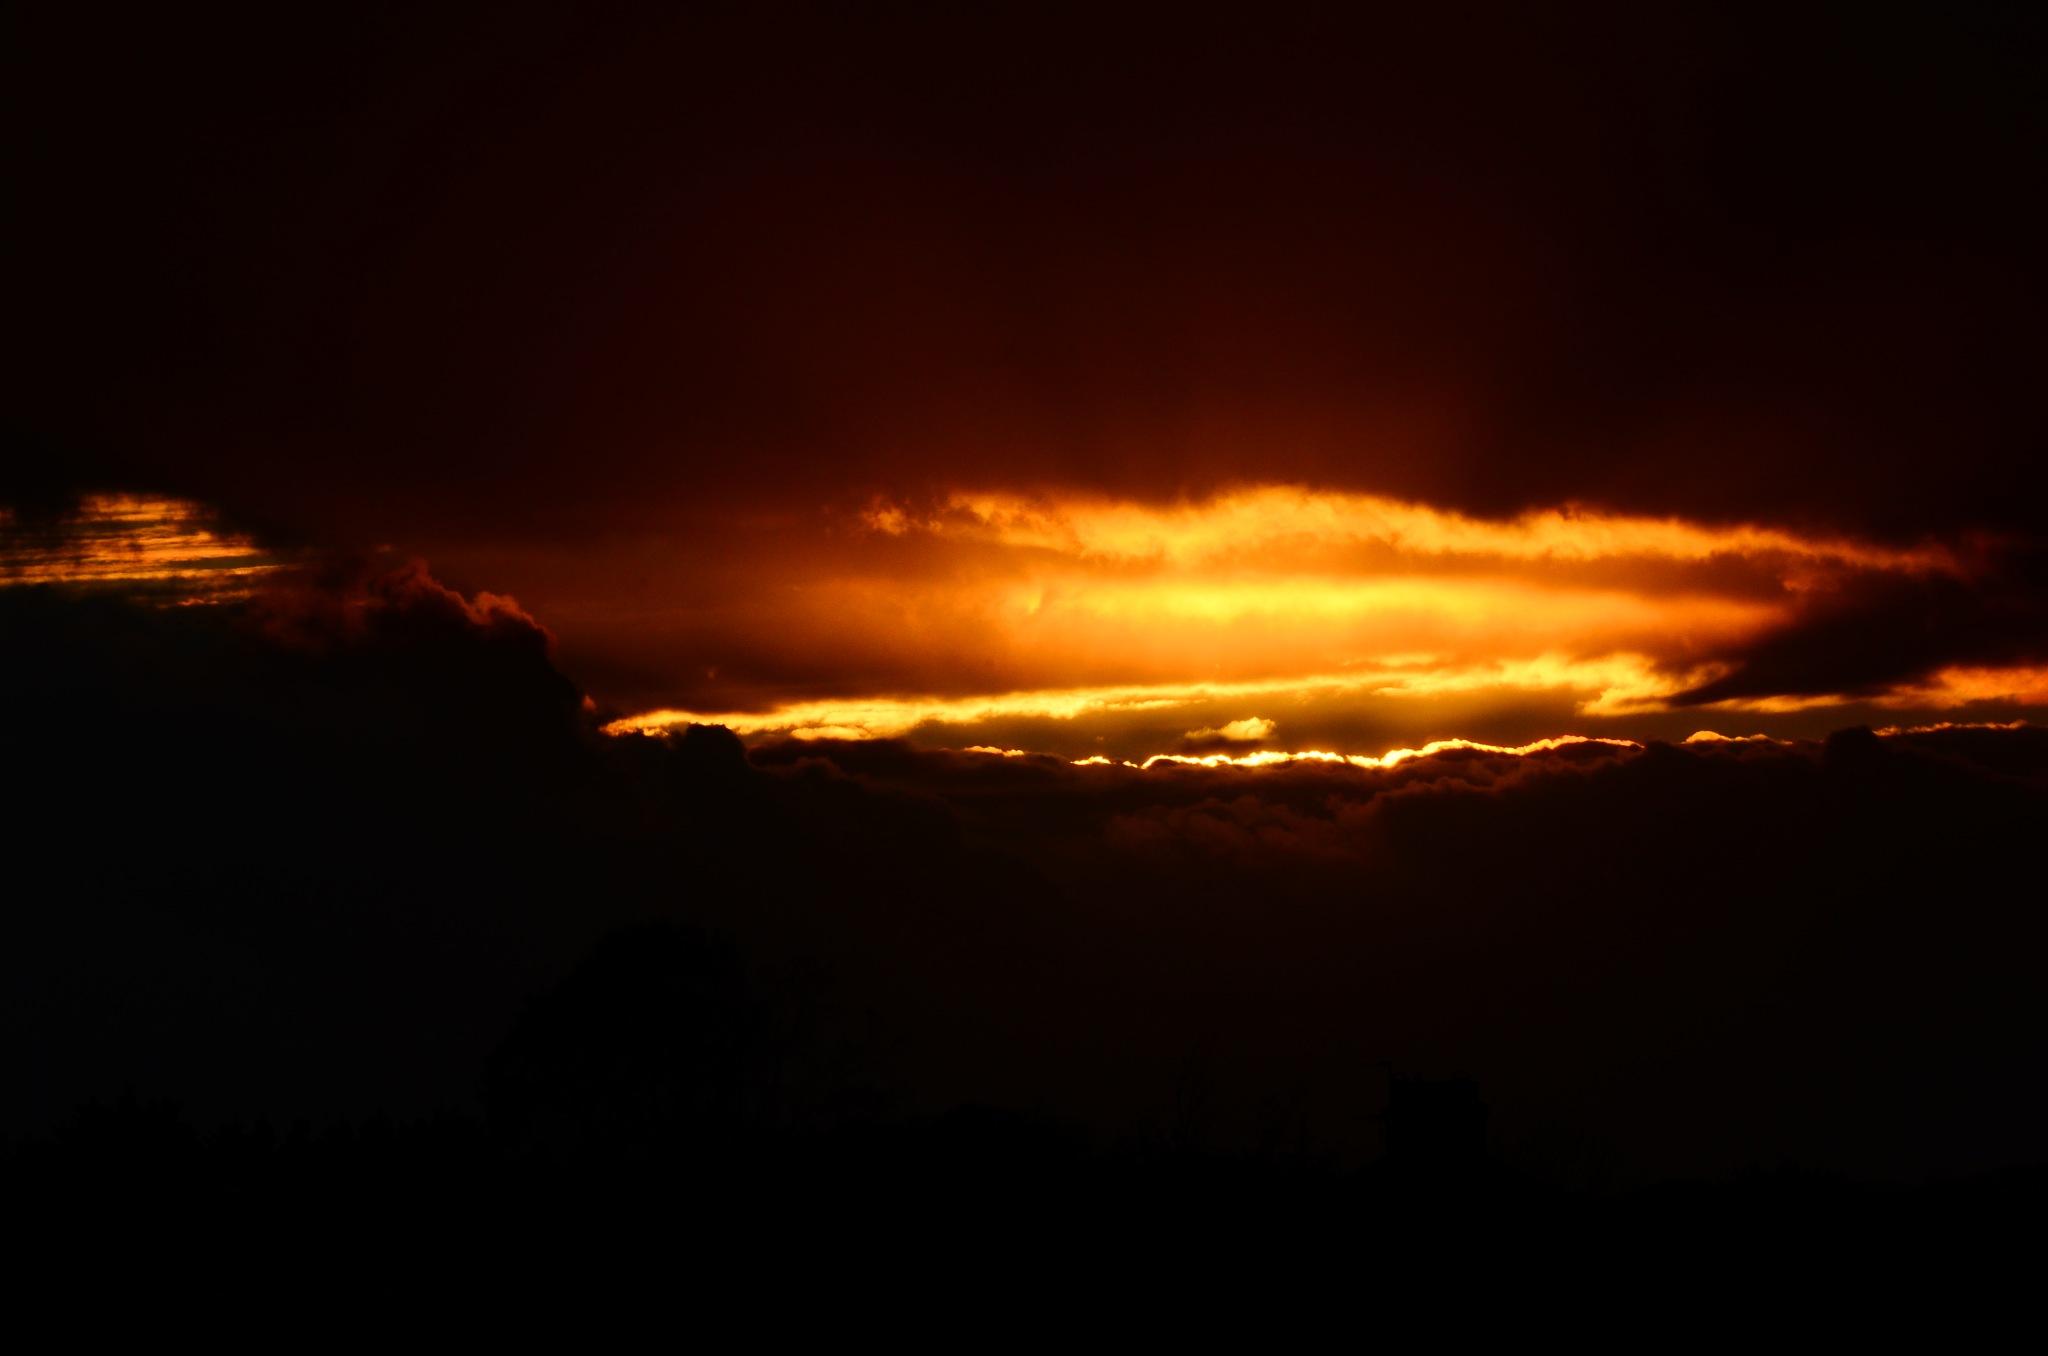 sunset part 2 by richard